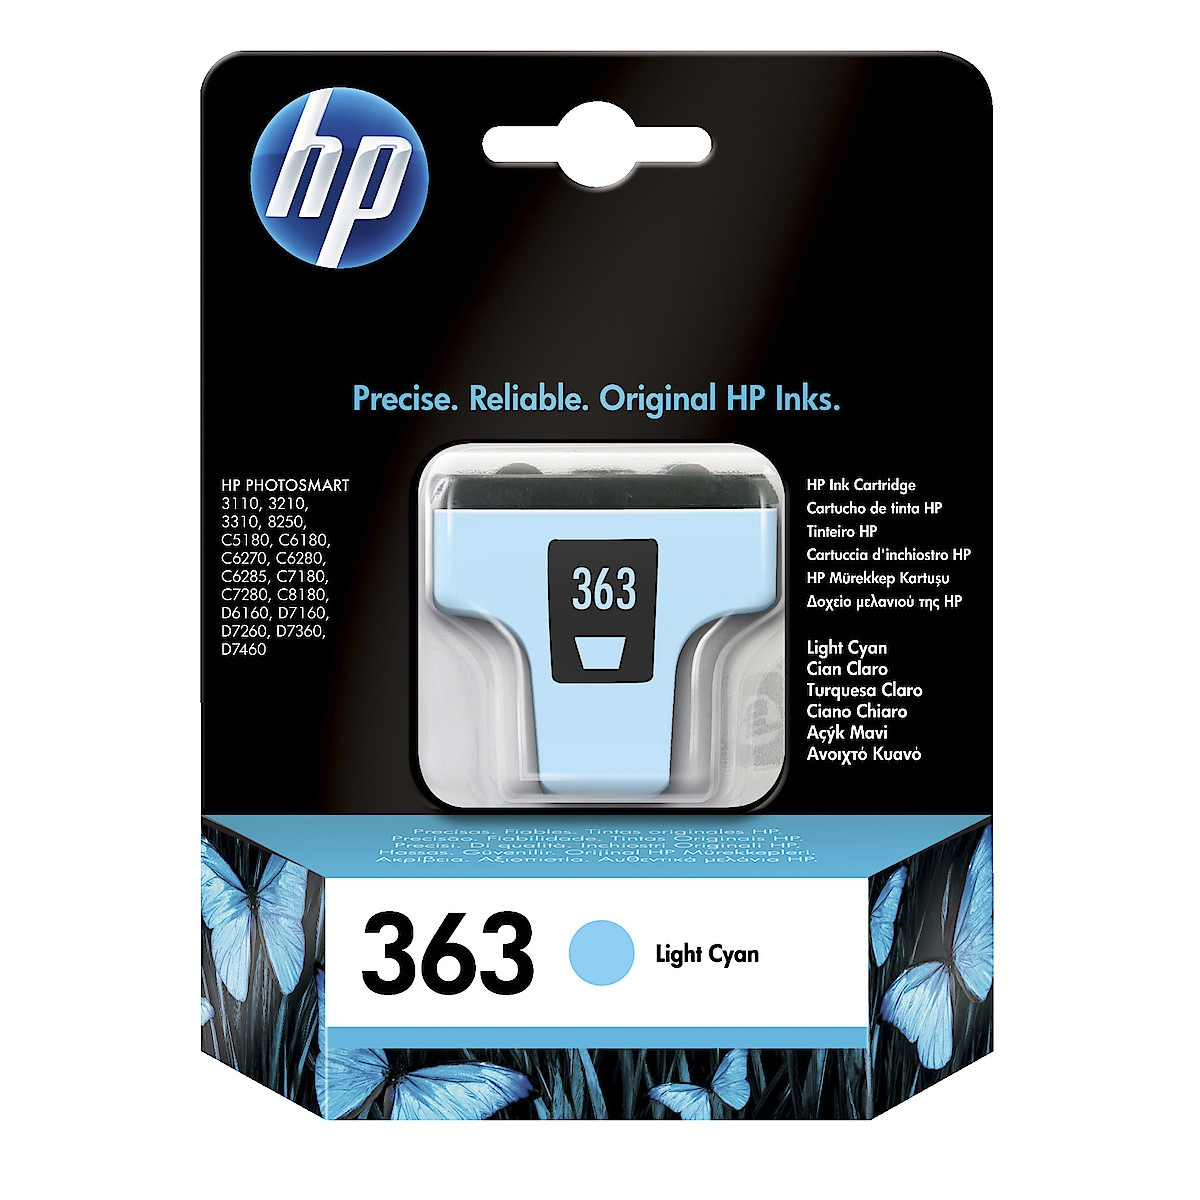 HP 363 Ink Cartridge